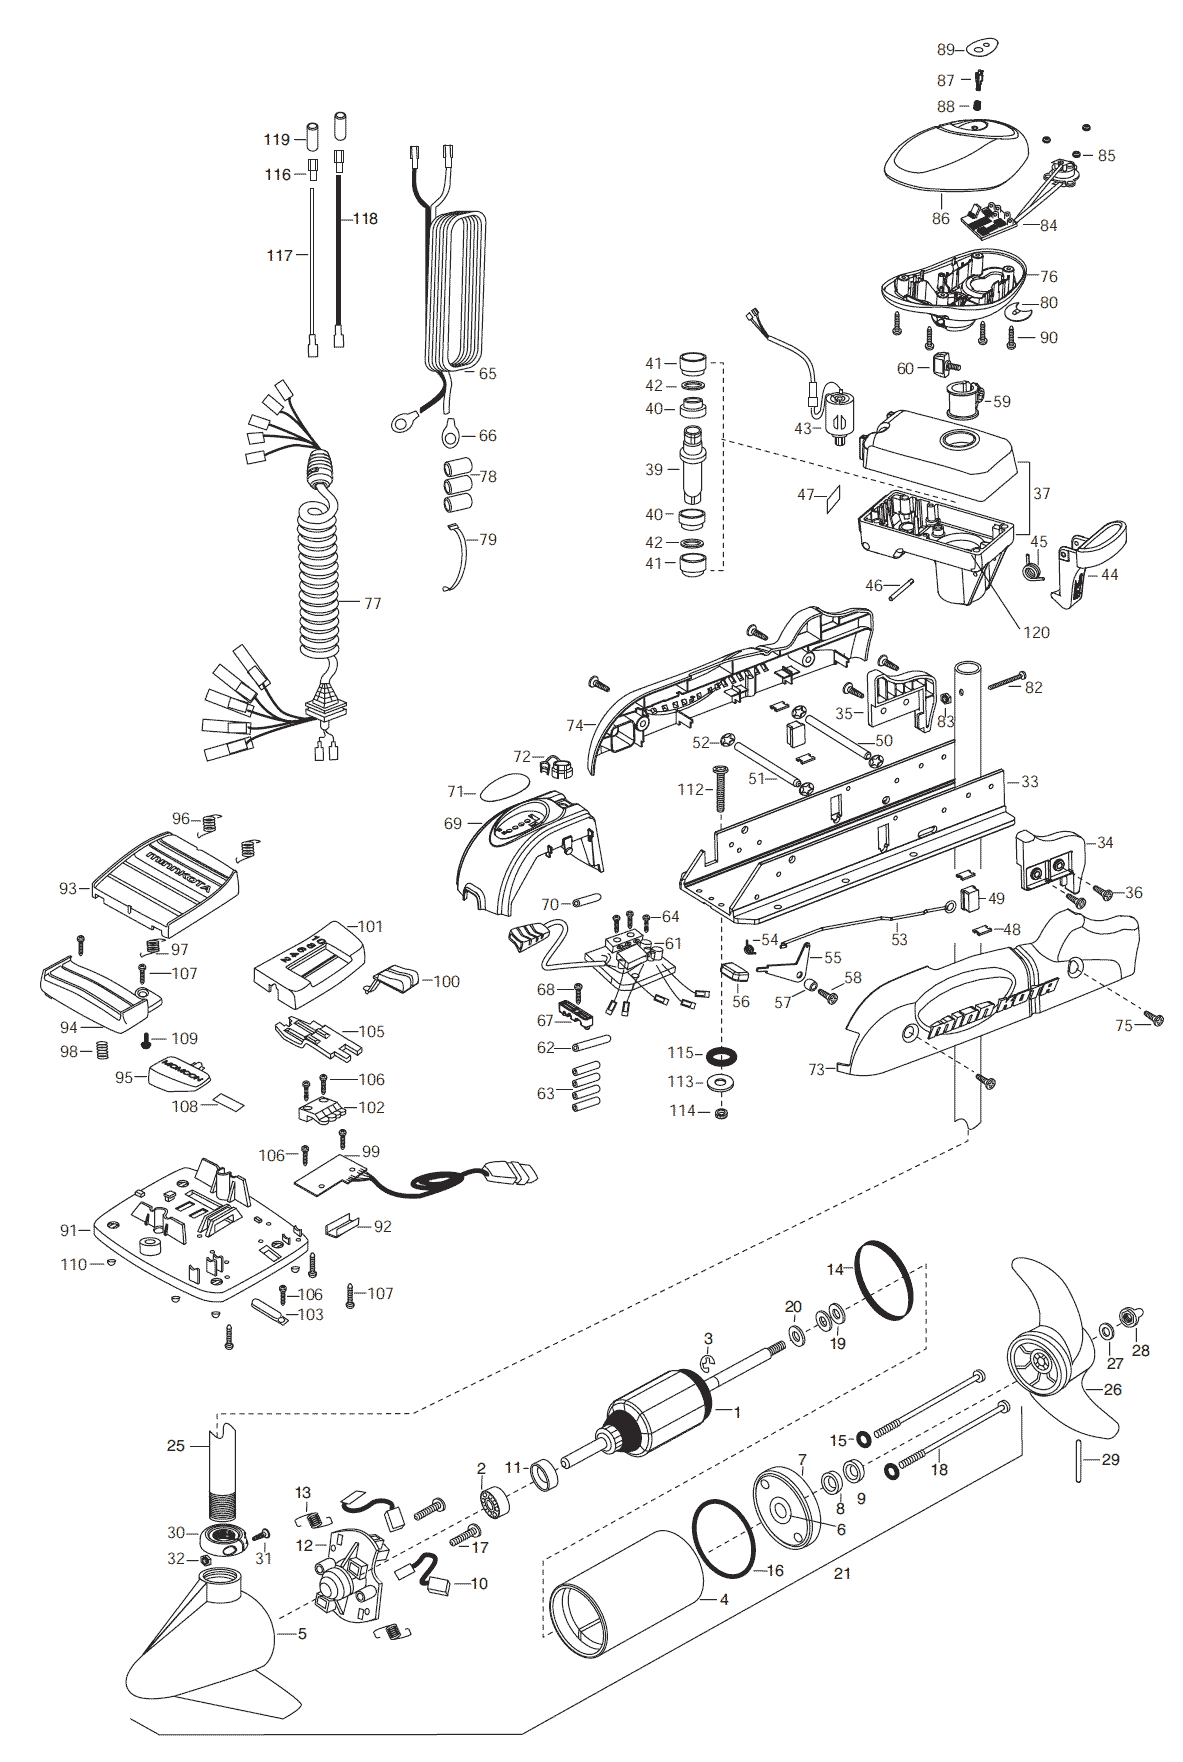 Minn Kota Riptide Autopilot 65 54 Inch Parts